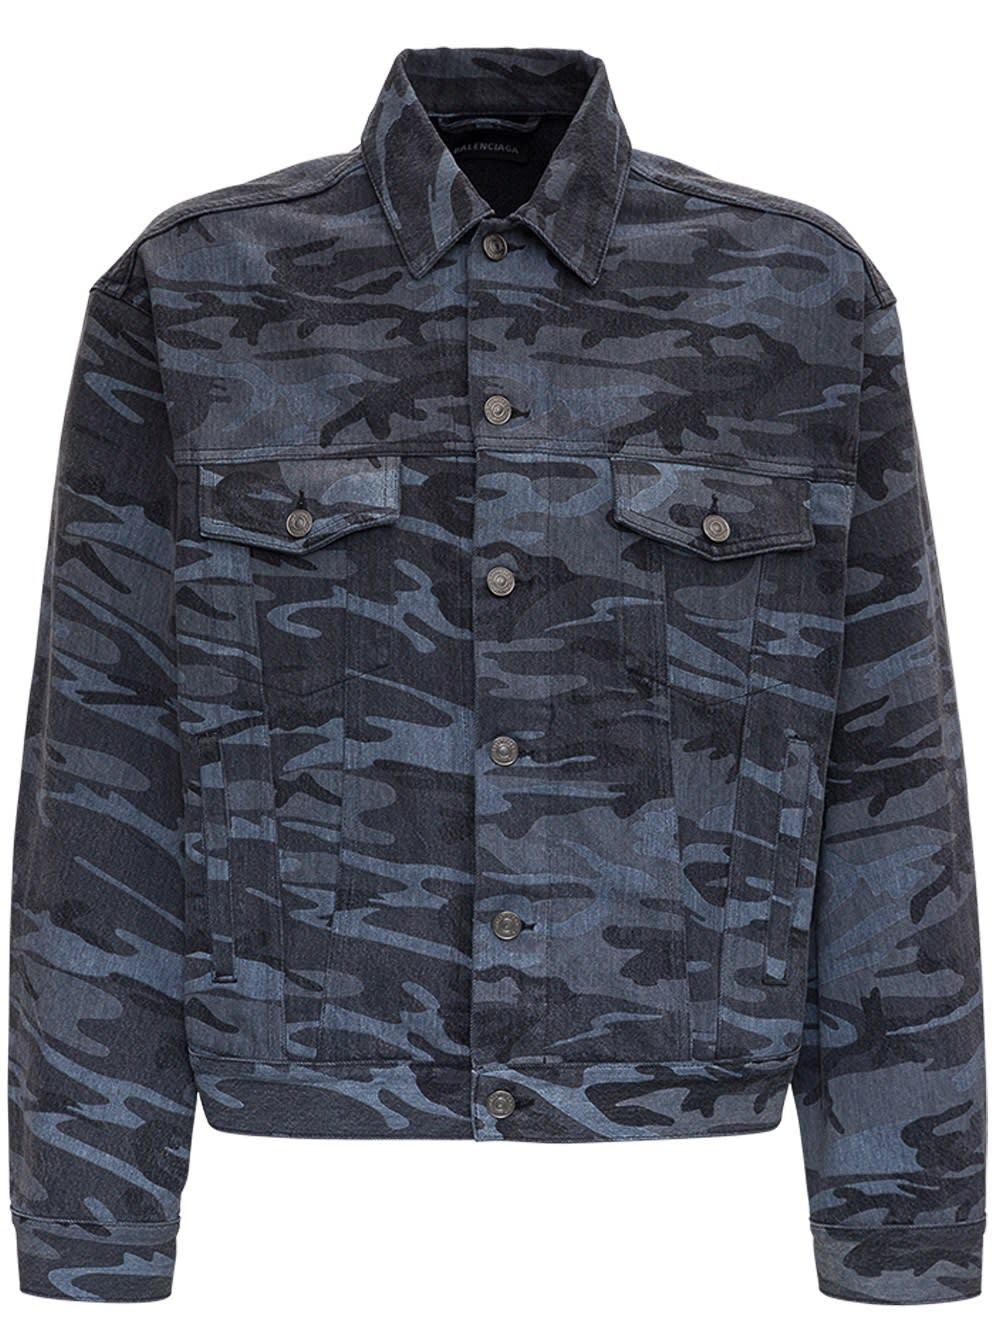 Balenciaga Gray Camouflage Denim Jacket